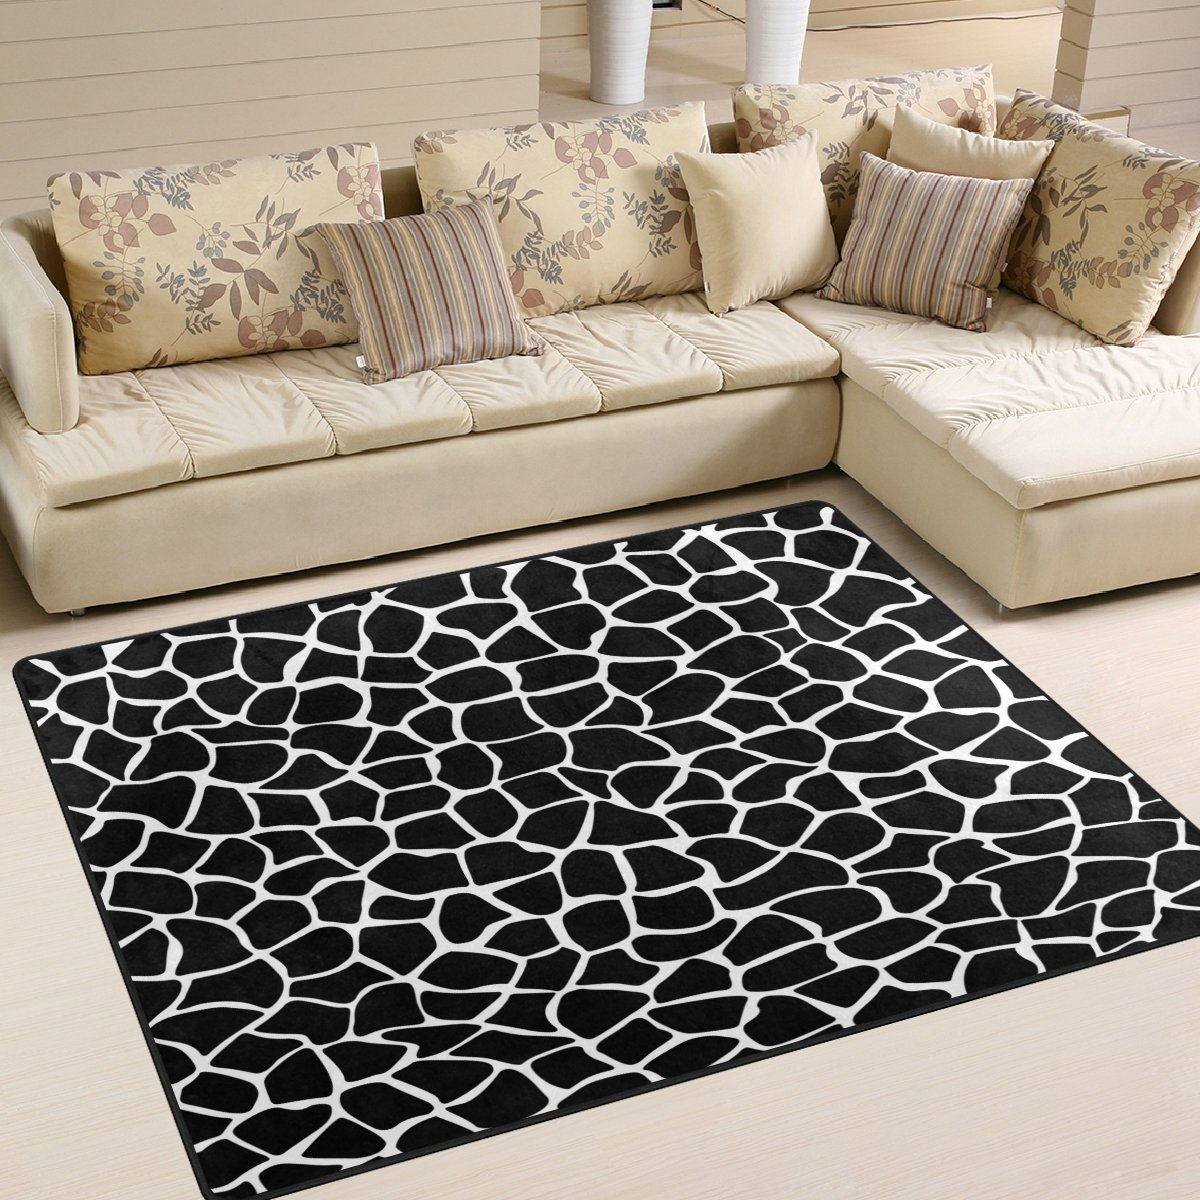 ALAZA Black White Giraffe Animal Print Area Rug Rugs for Living Room Bedroom 5'3 x 4' g3663908p147c162s244